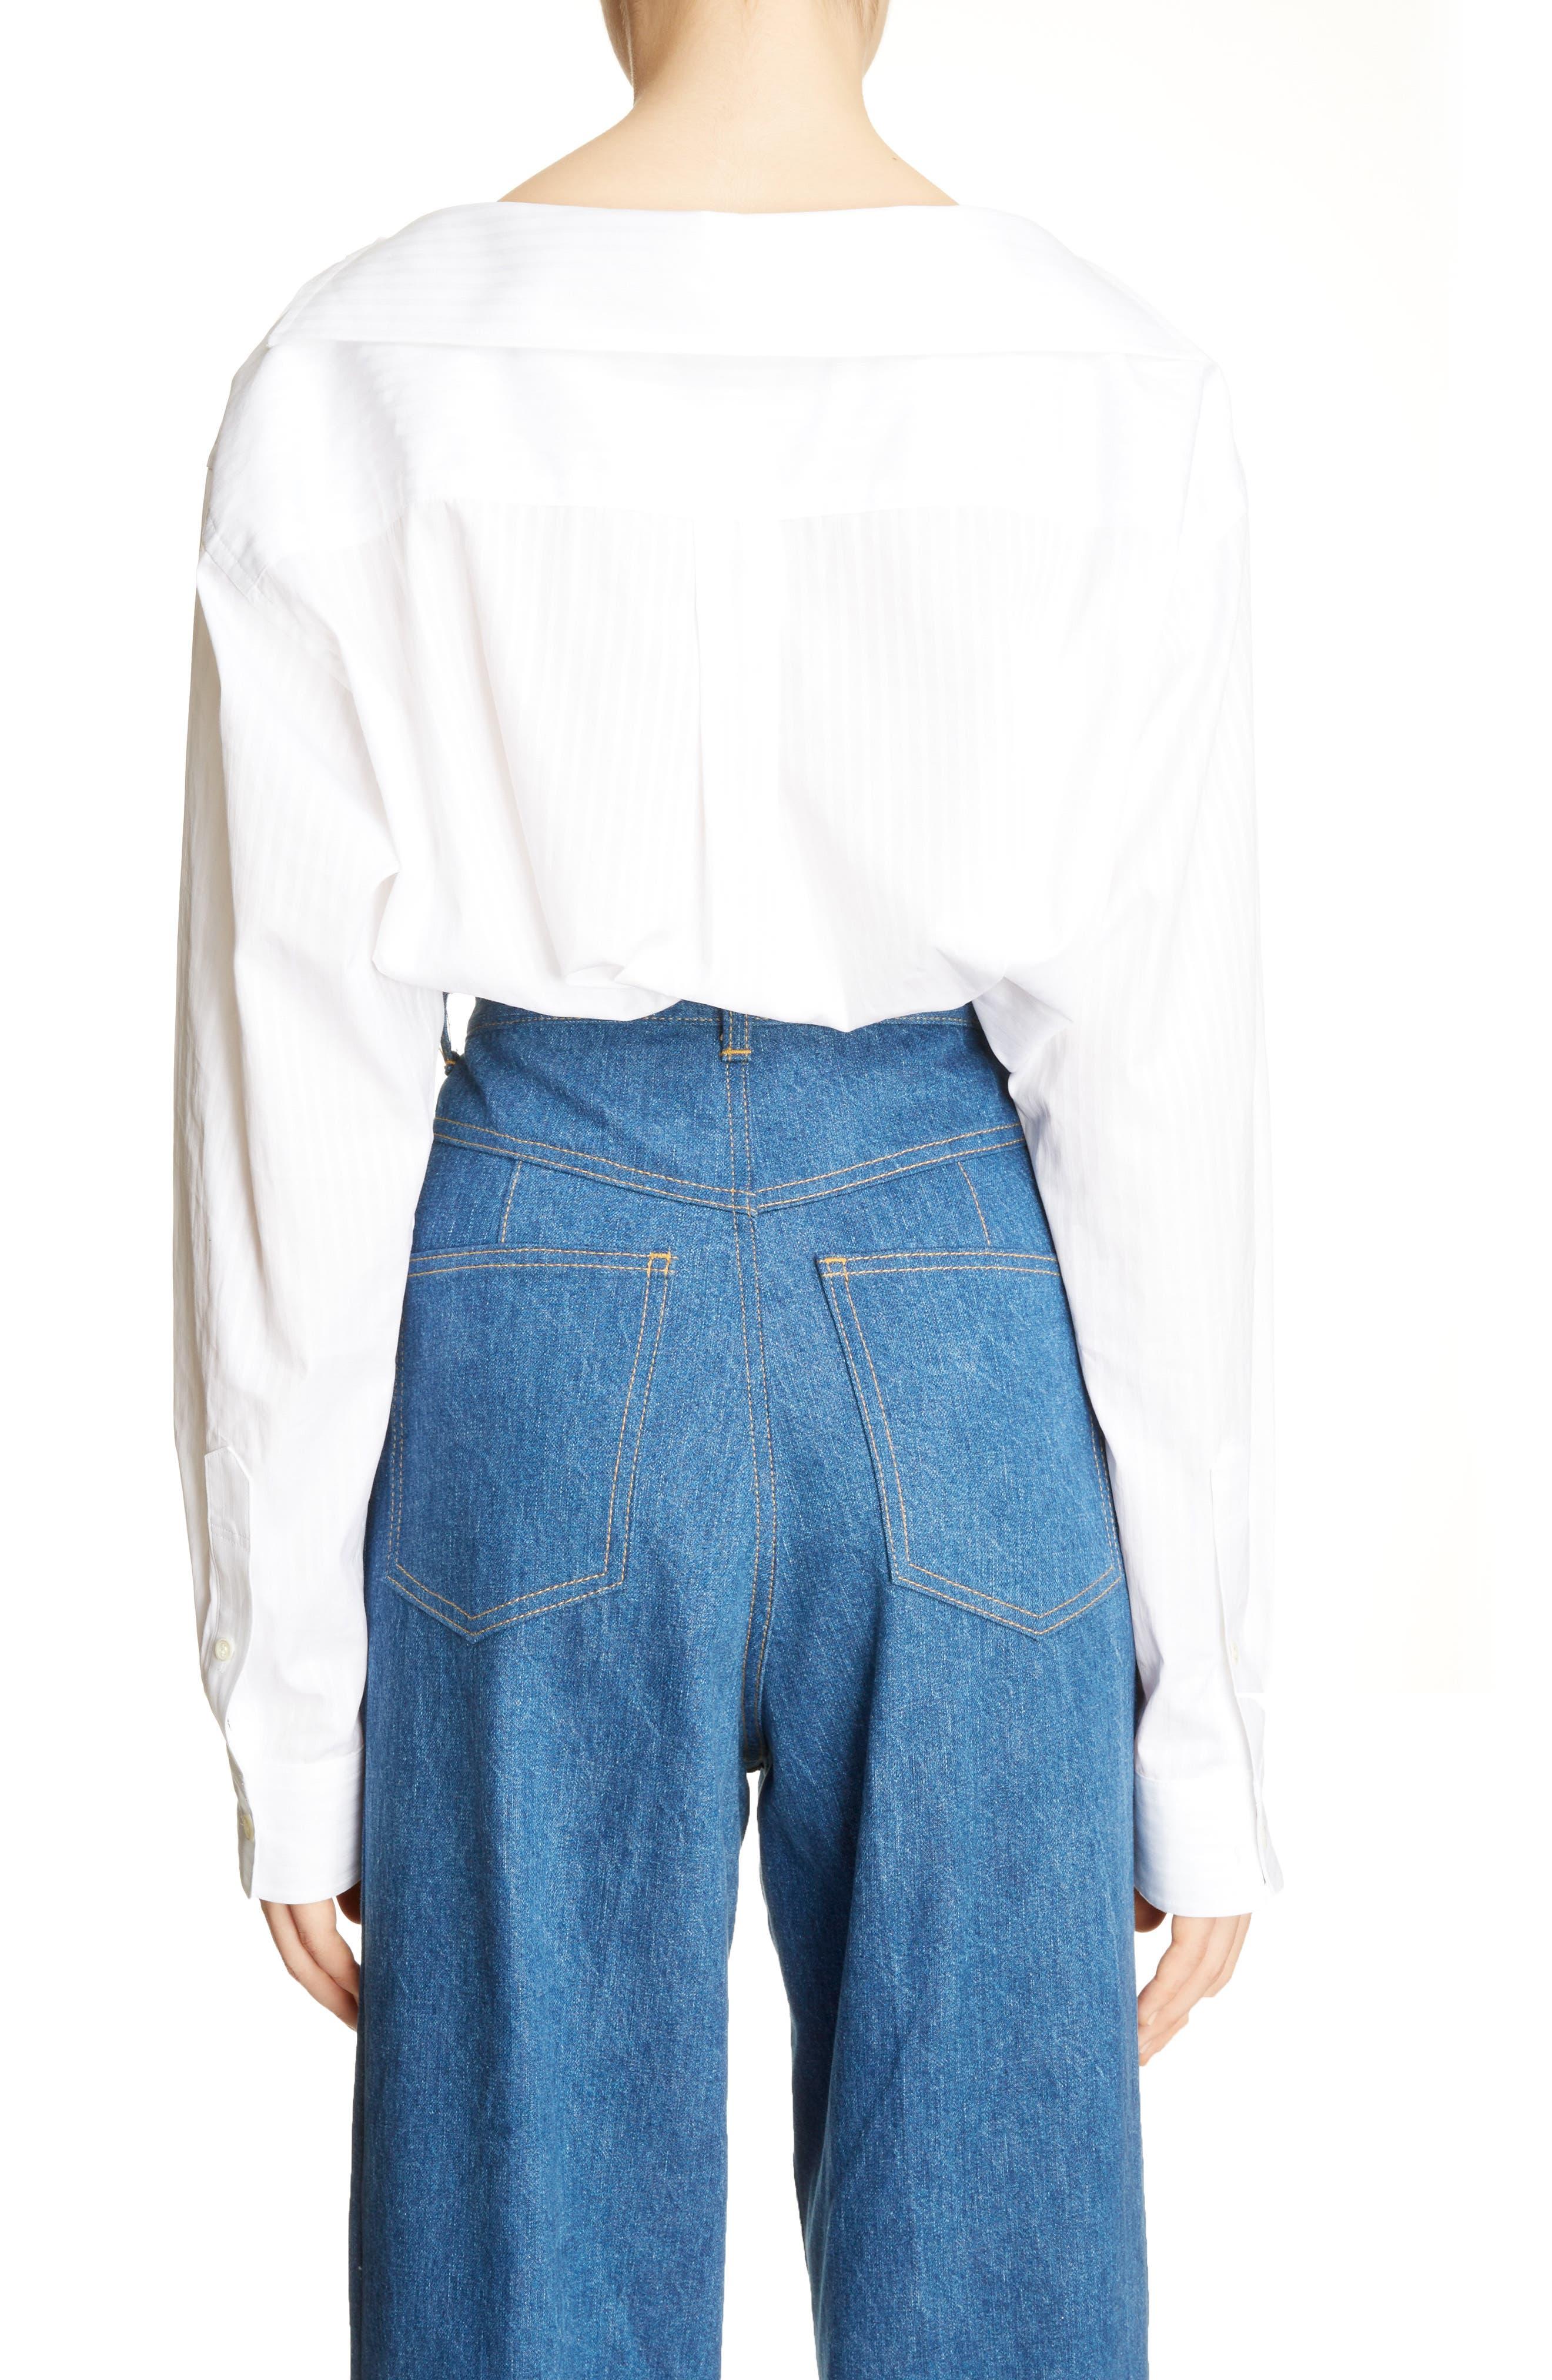 Asymmetrical One-Shoulder Blouse,                             Alternate thumbnail 2, color,                             White